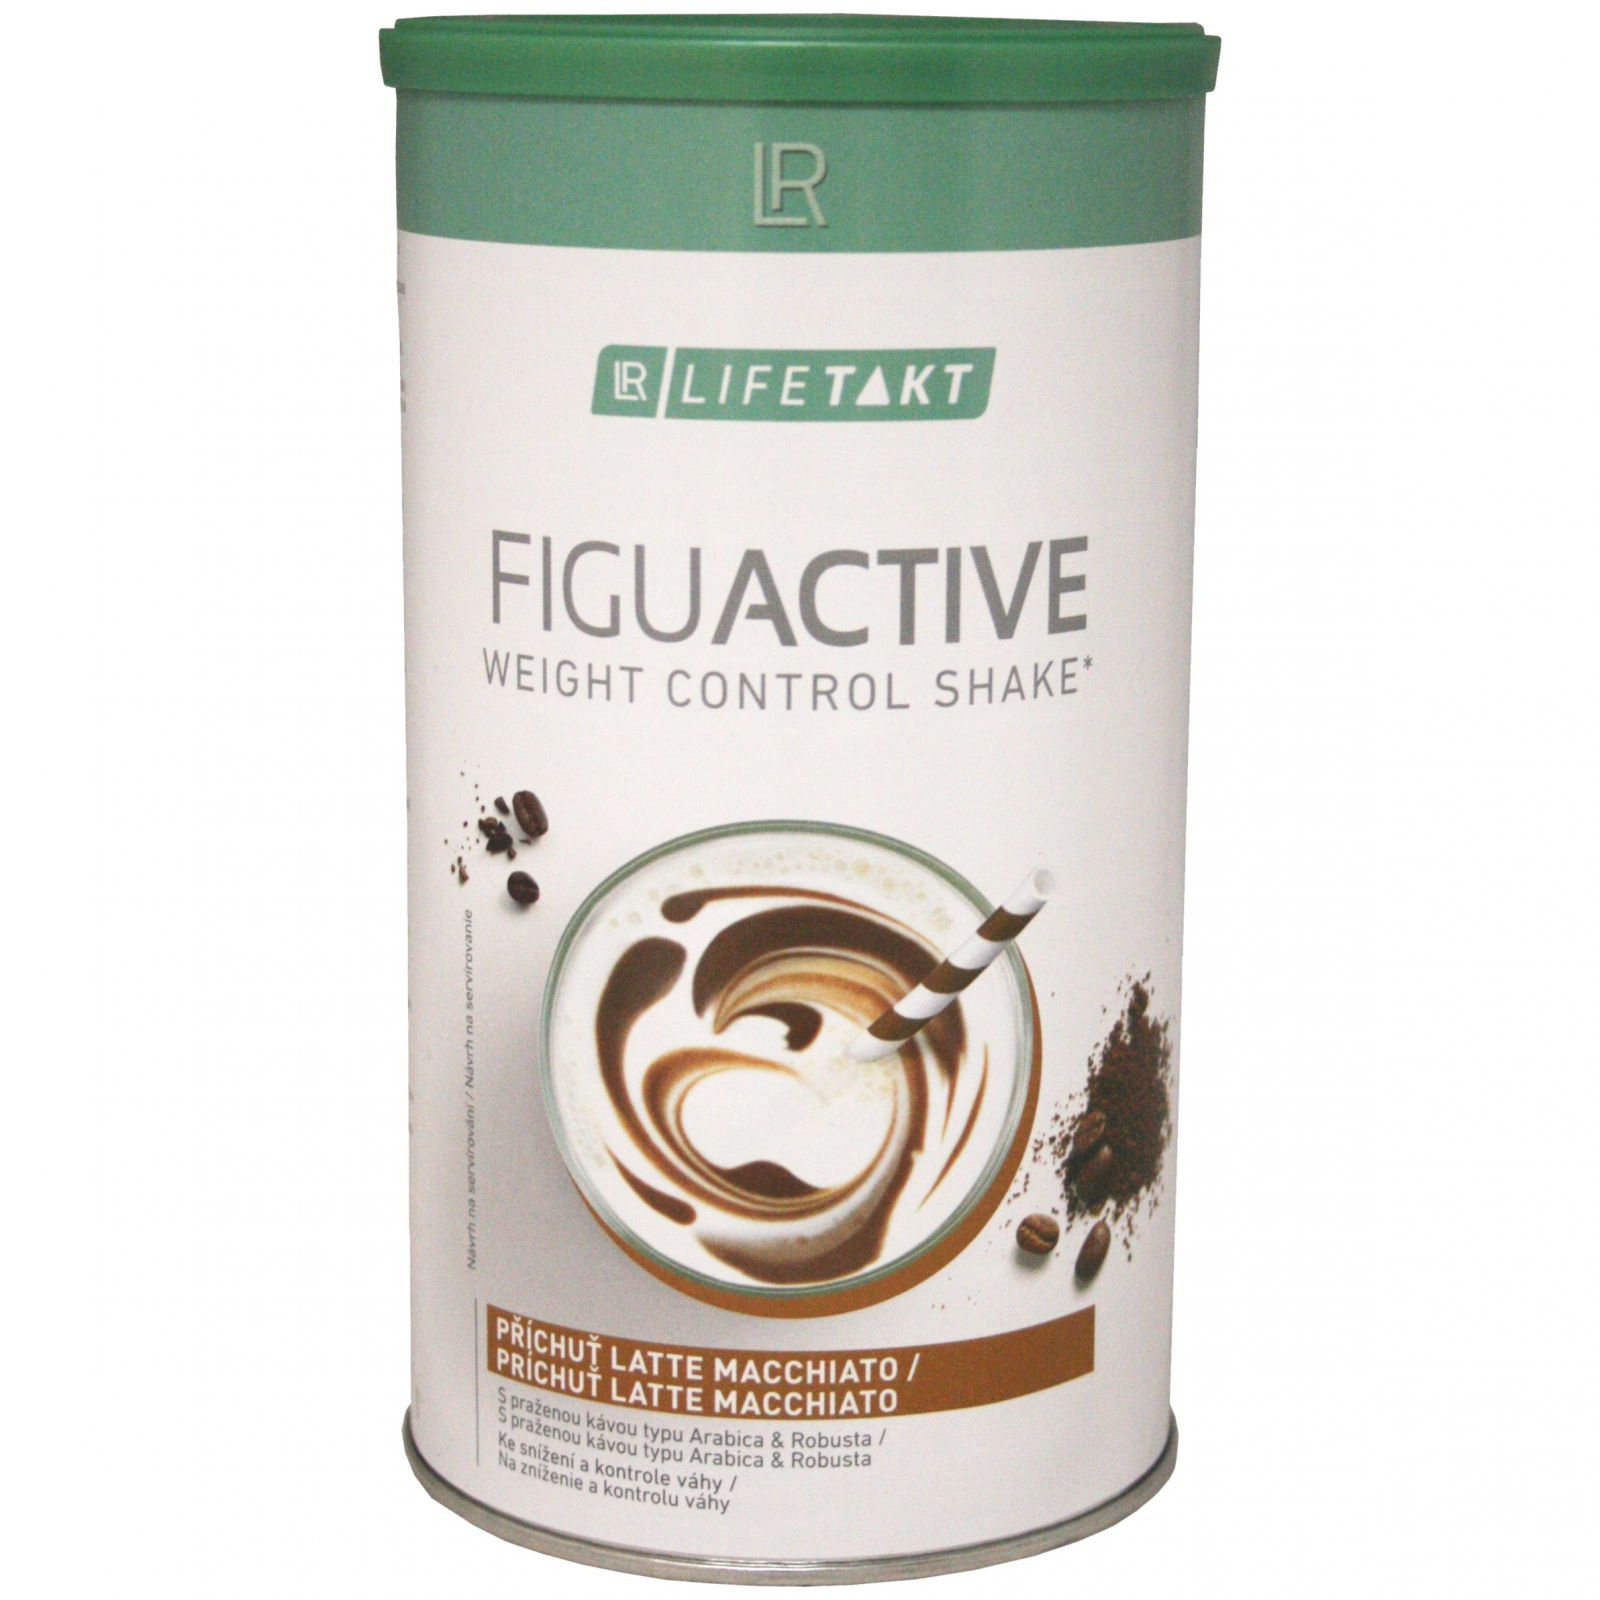 LR LIFETAKT Figu Active kojtel Latte-macchiato 450 g